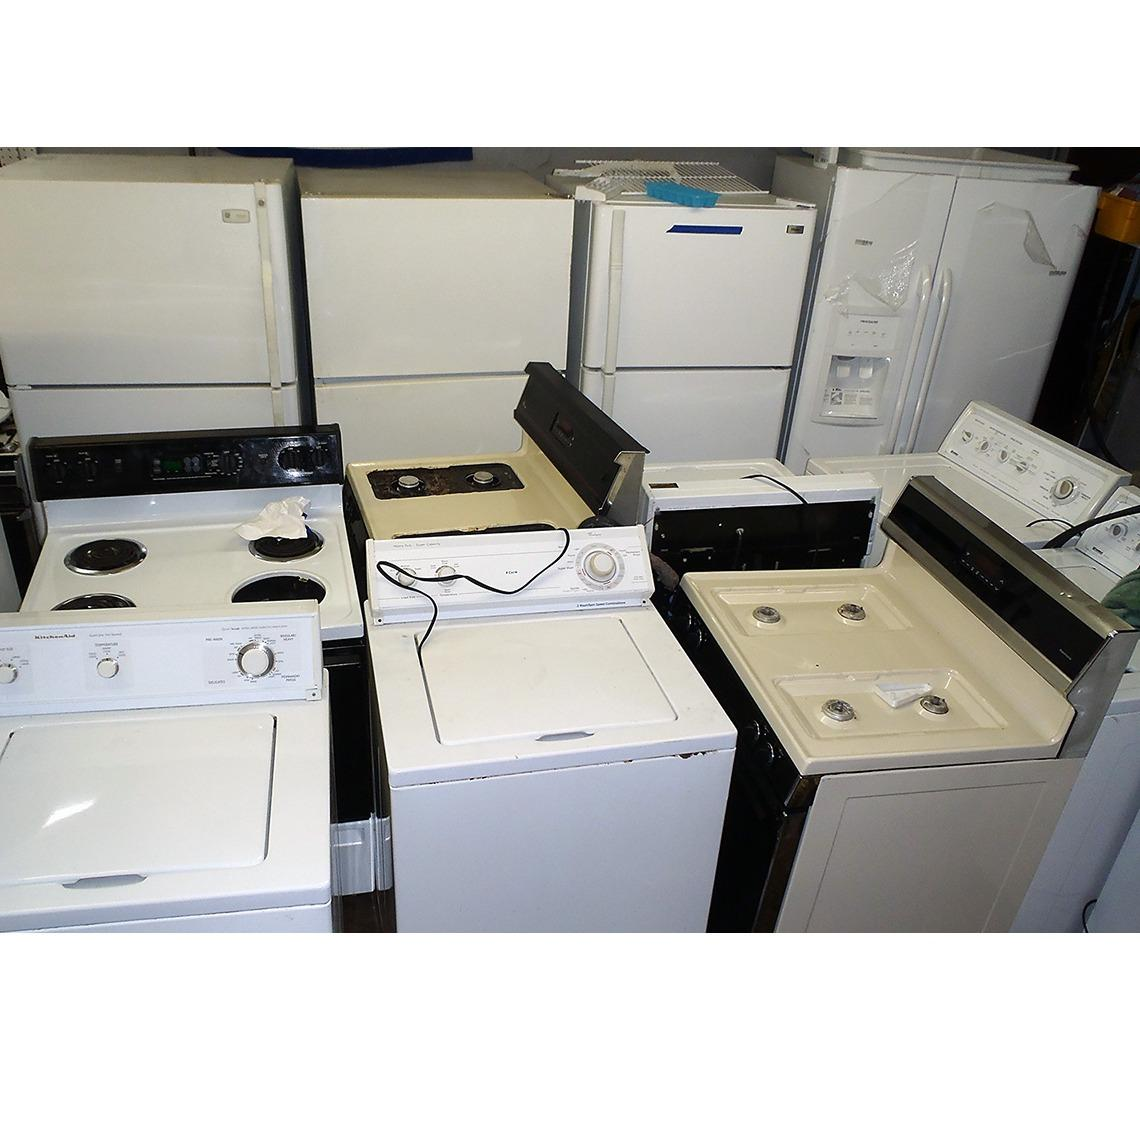 Best Price Appliances image 3